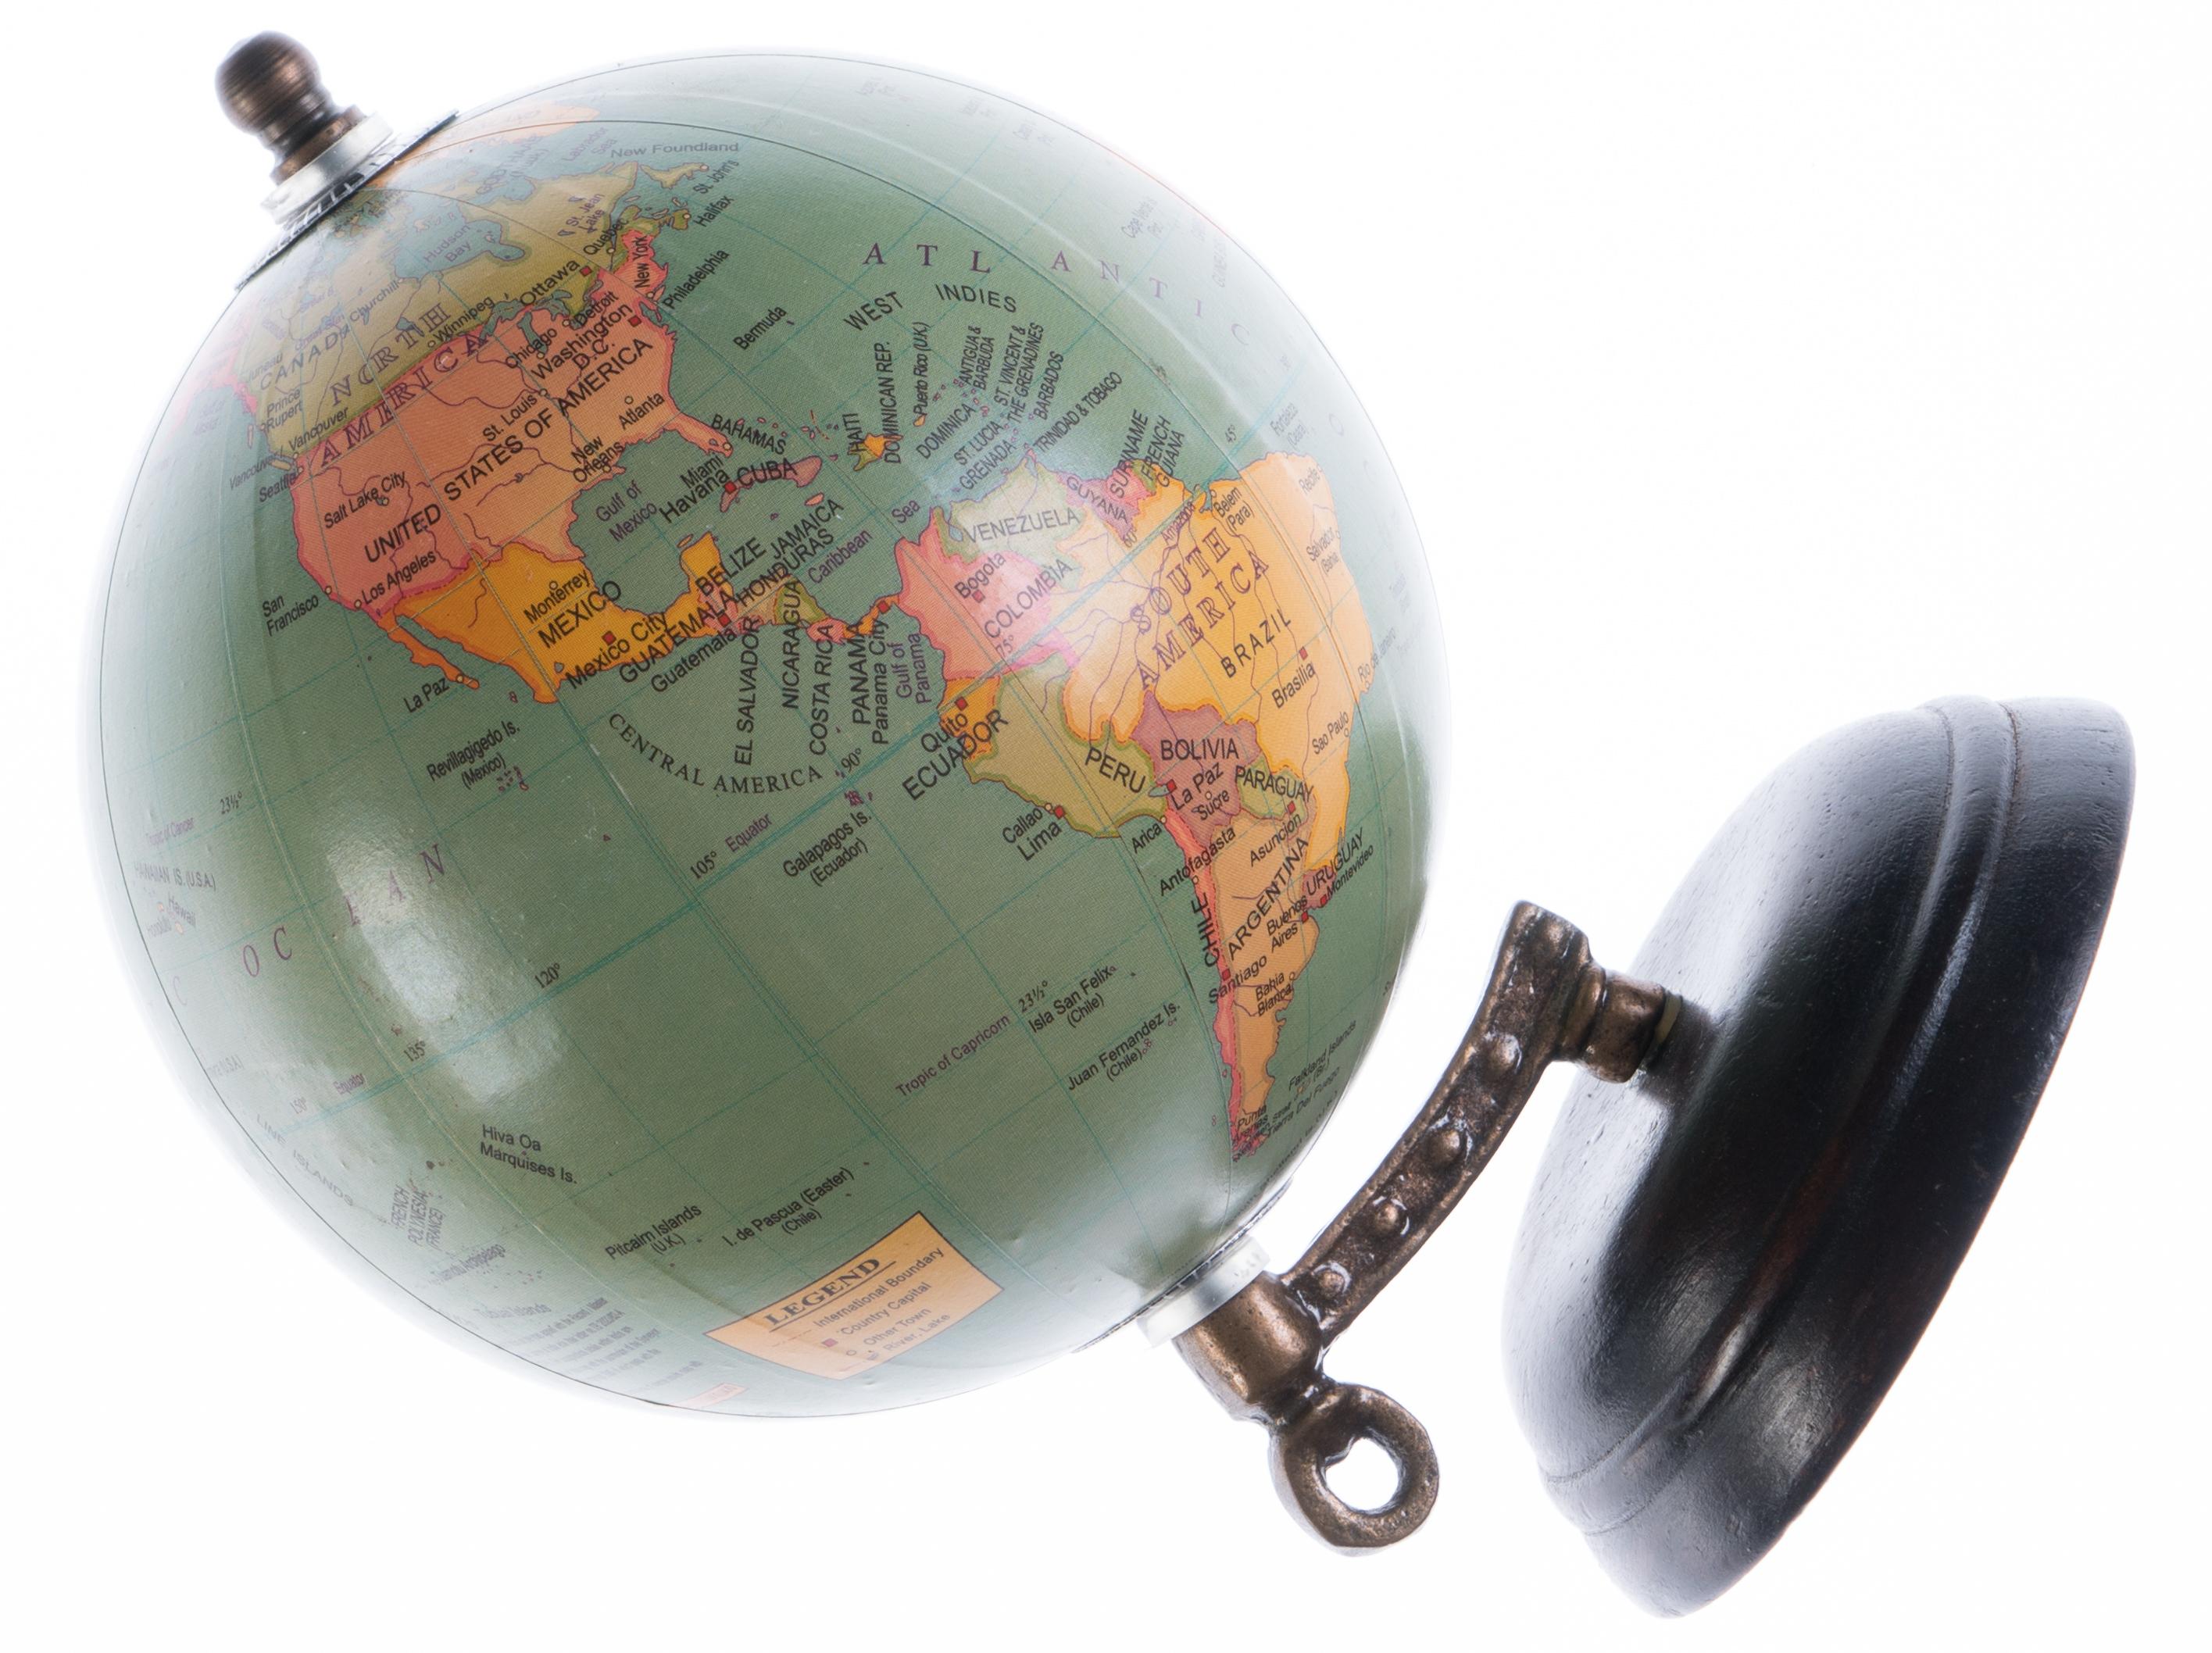 International shipping an antique globe